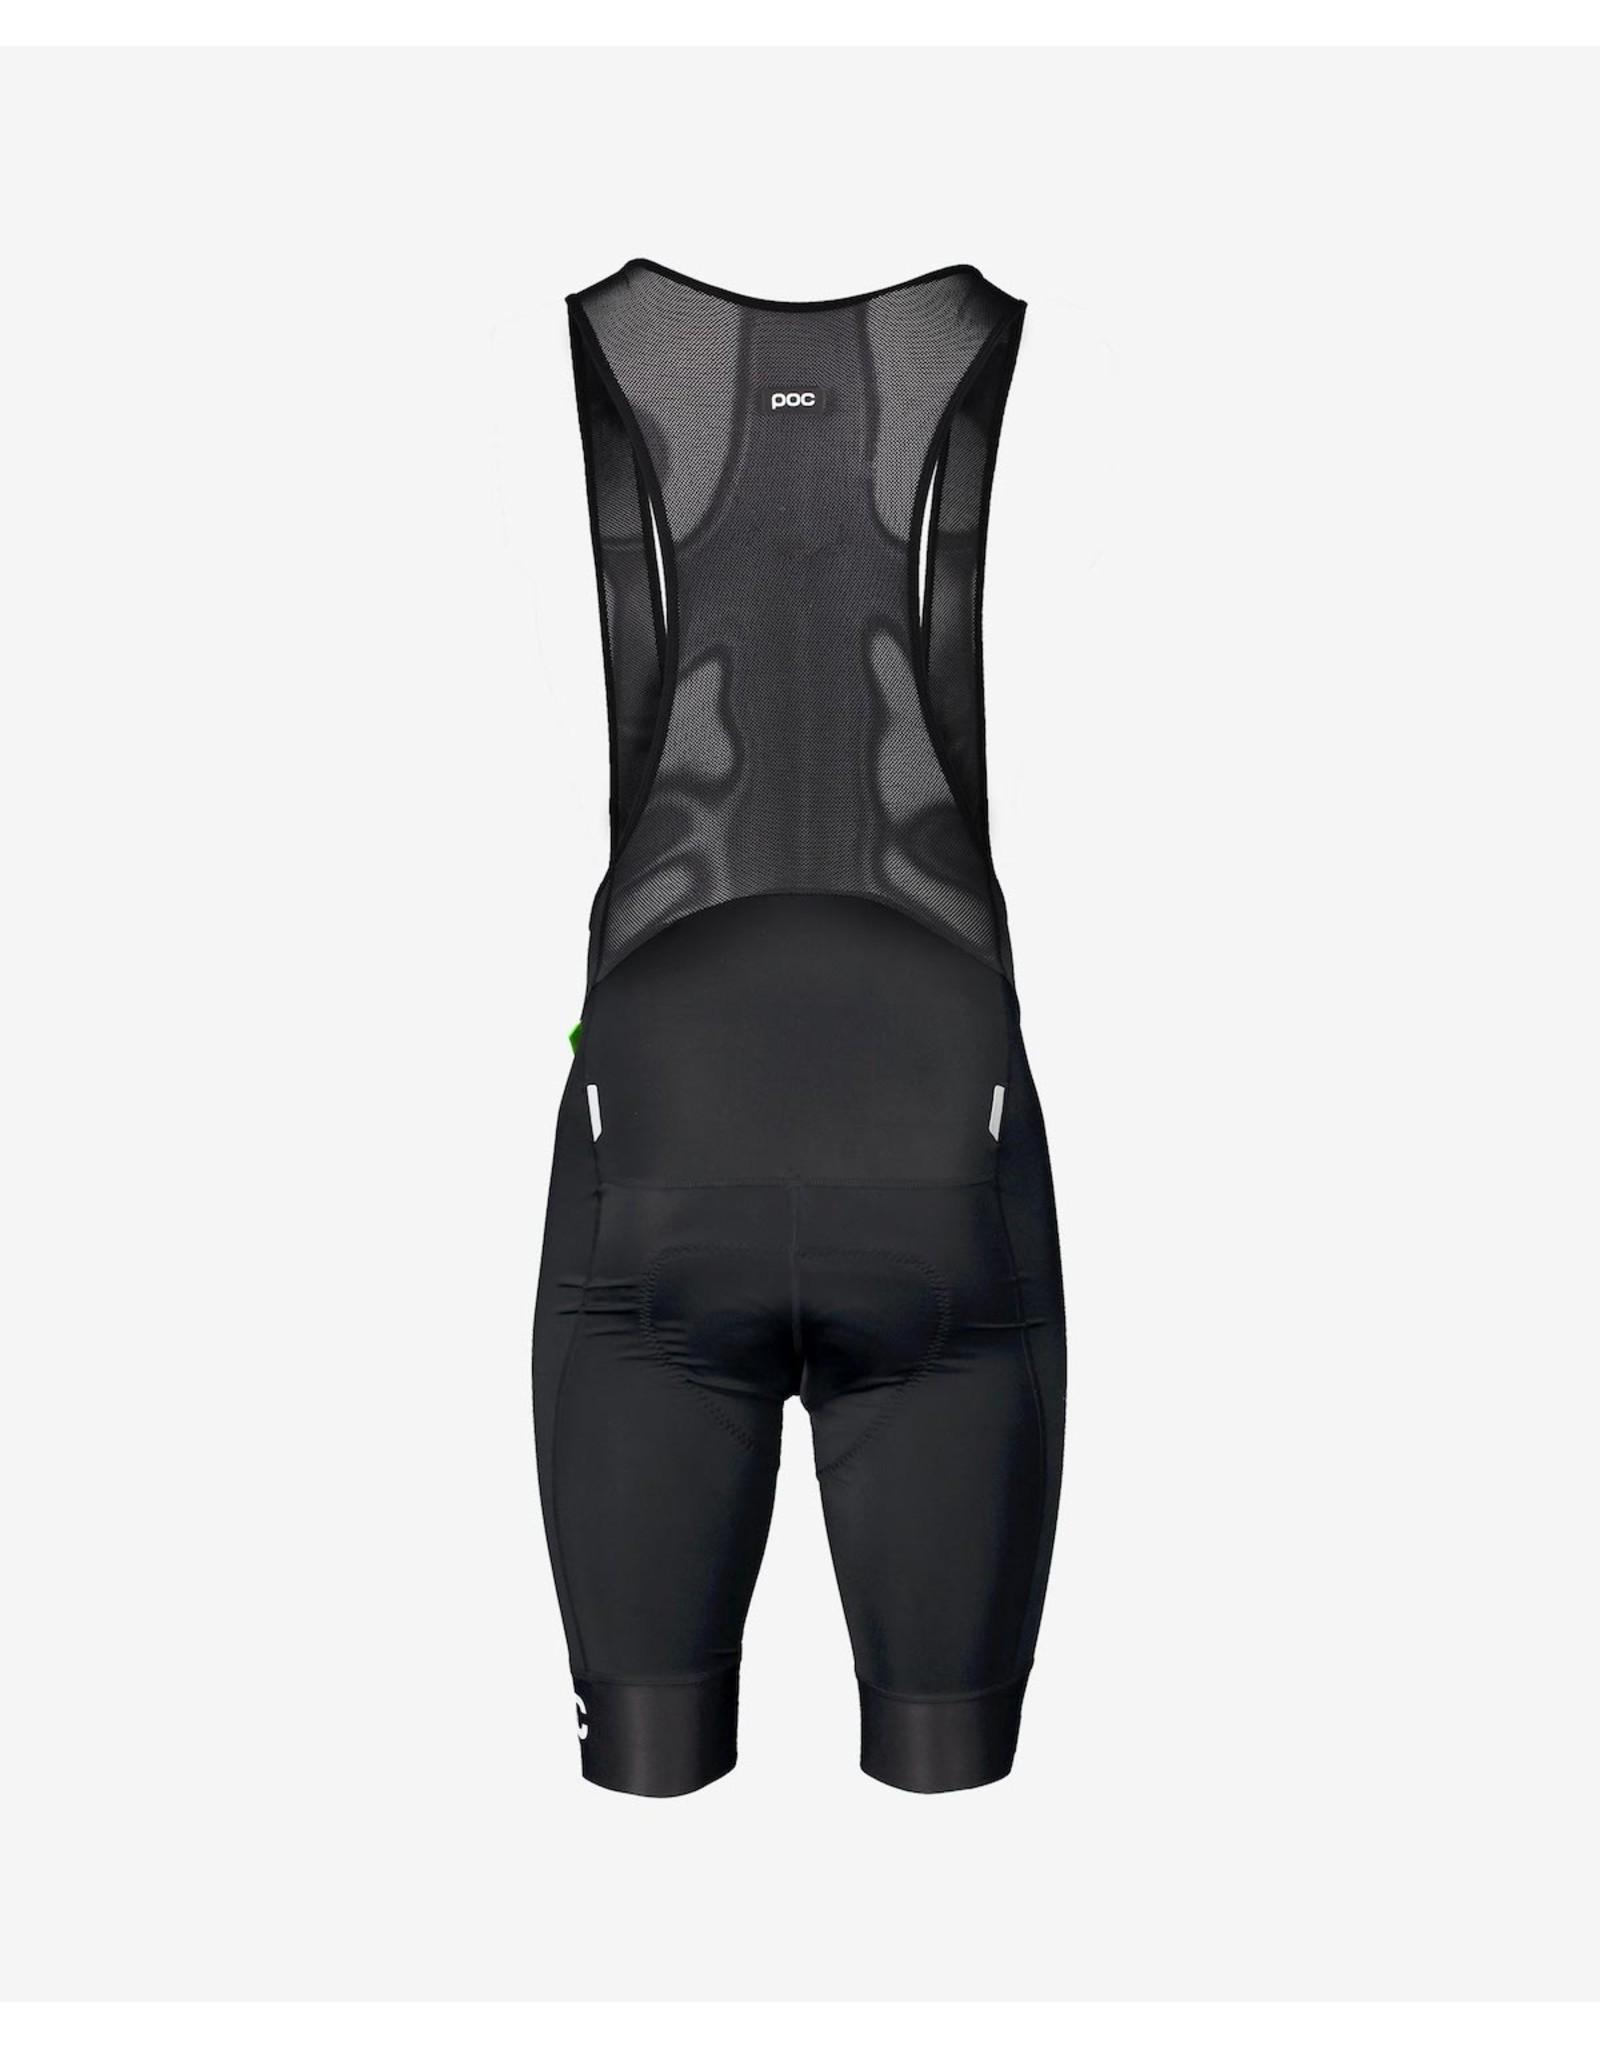 POC POC Road Thermal Bib Shorts